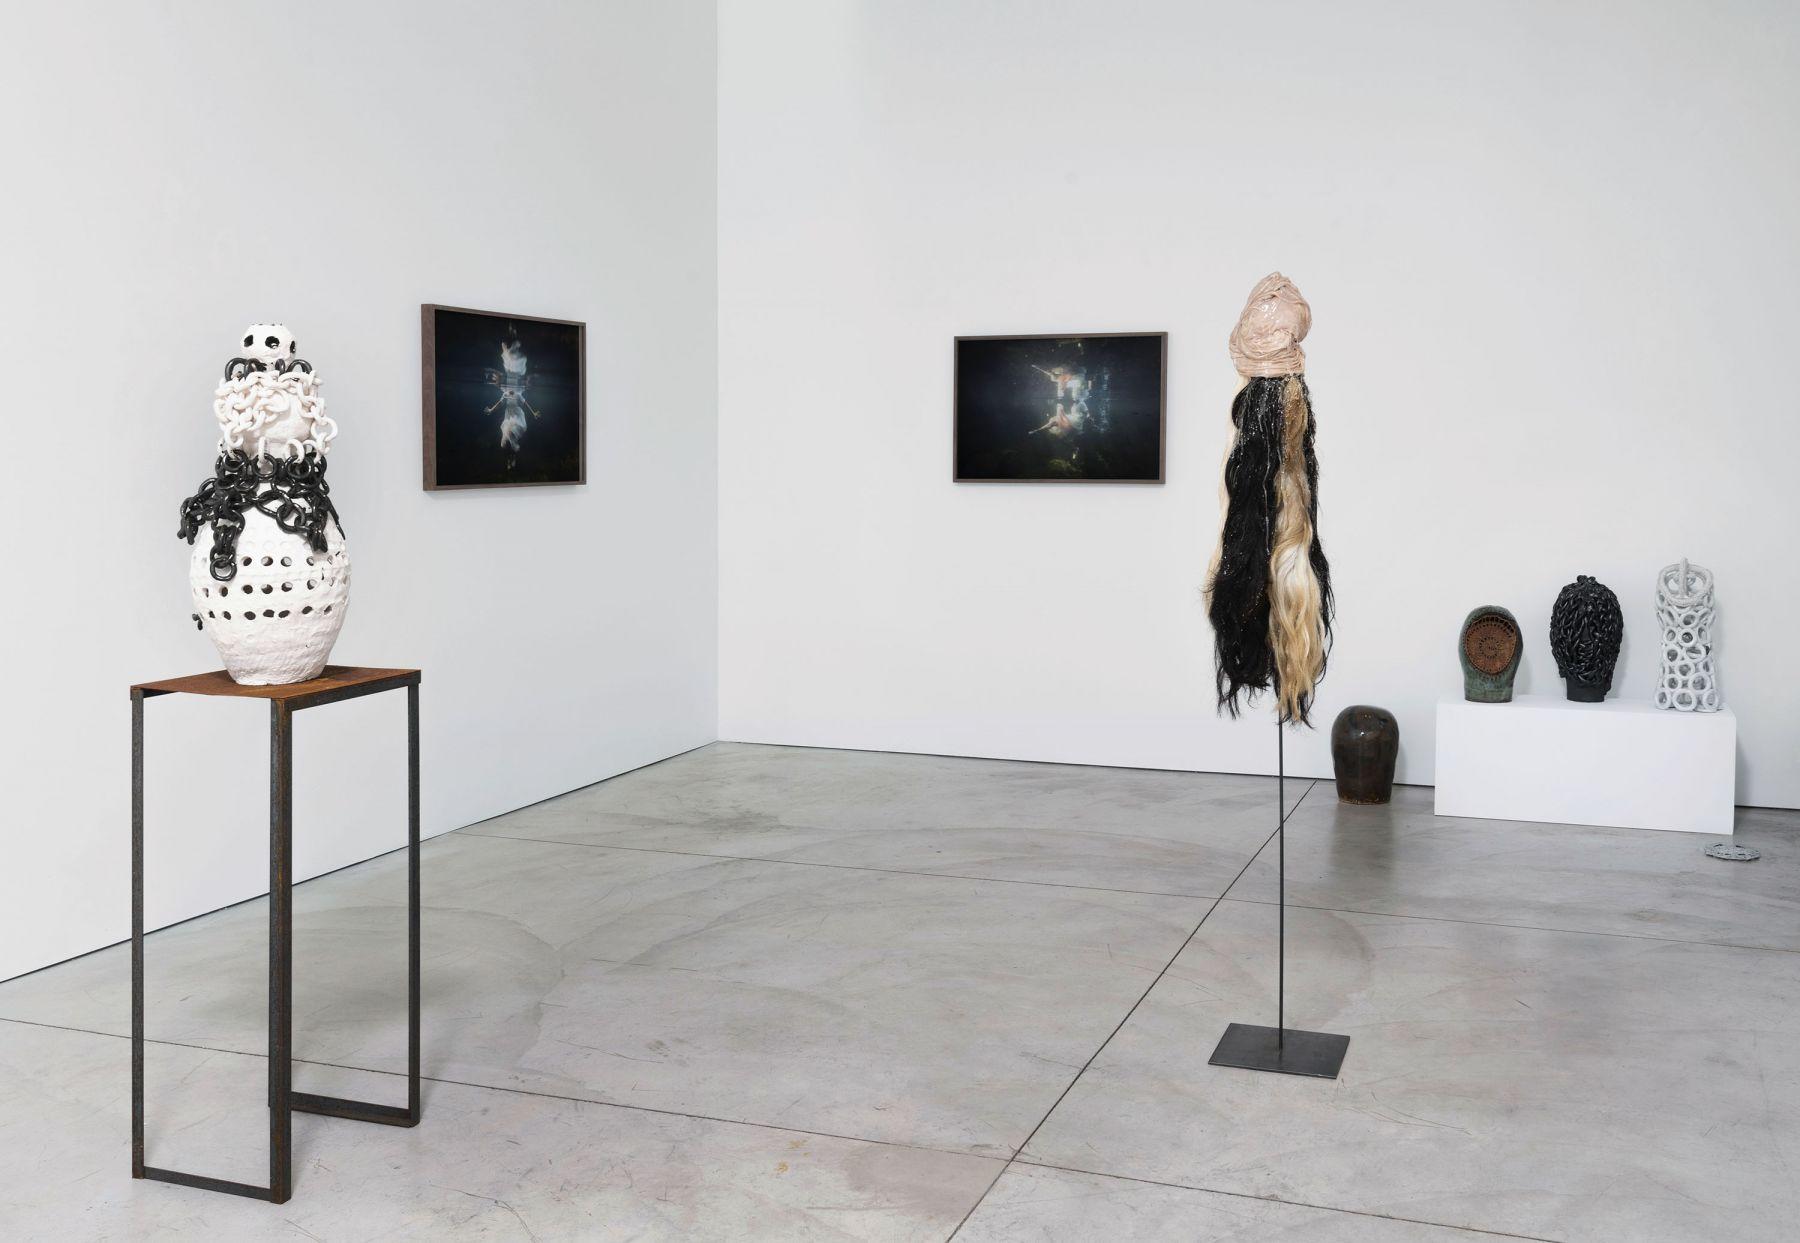 Tricknology(Installation View), Marianne Boesky Gallery, Aspen,2019